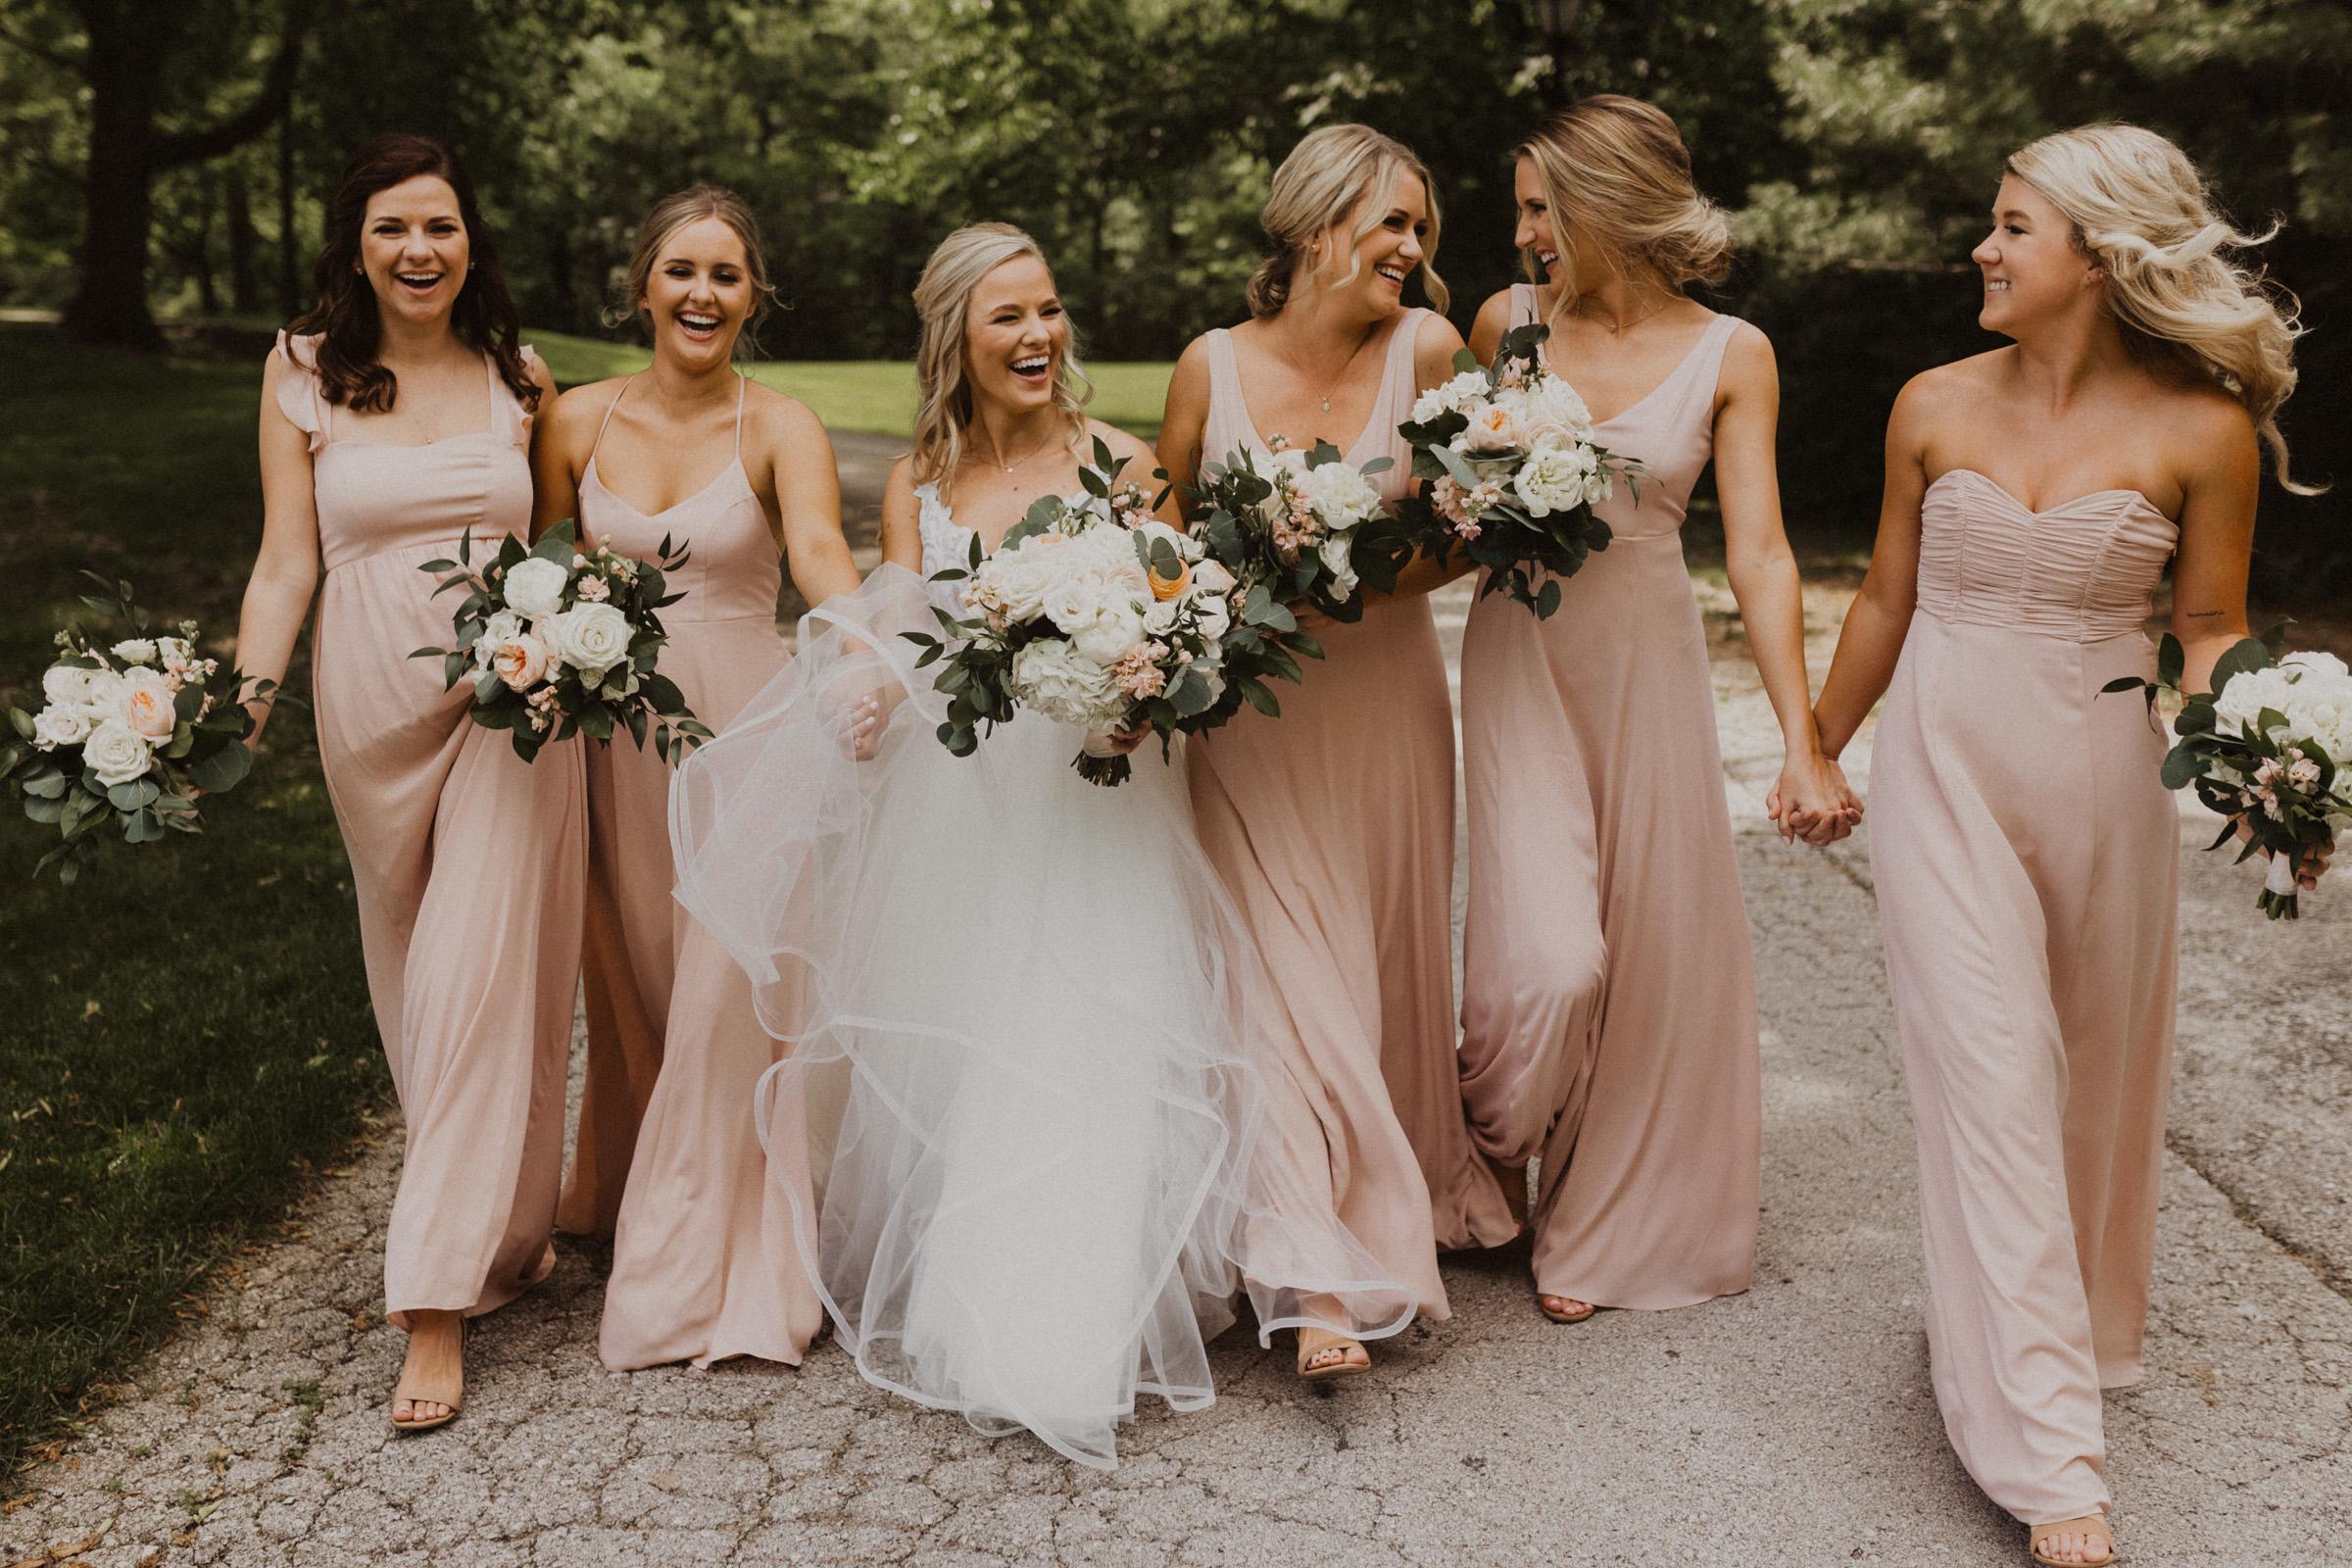 alyssa barletter photography hawthorne house summer outdoor wedding southern charm inspiration-24.jpg